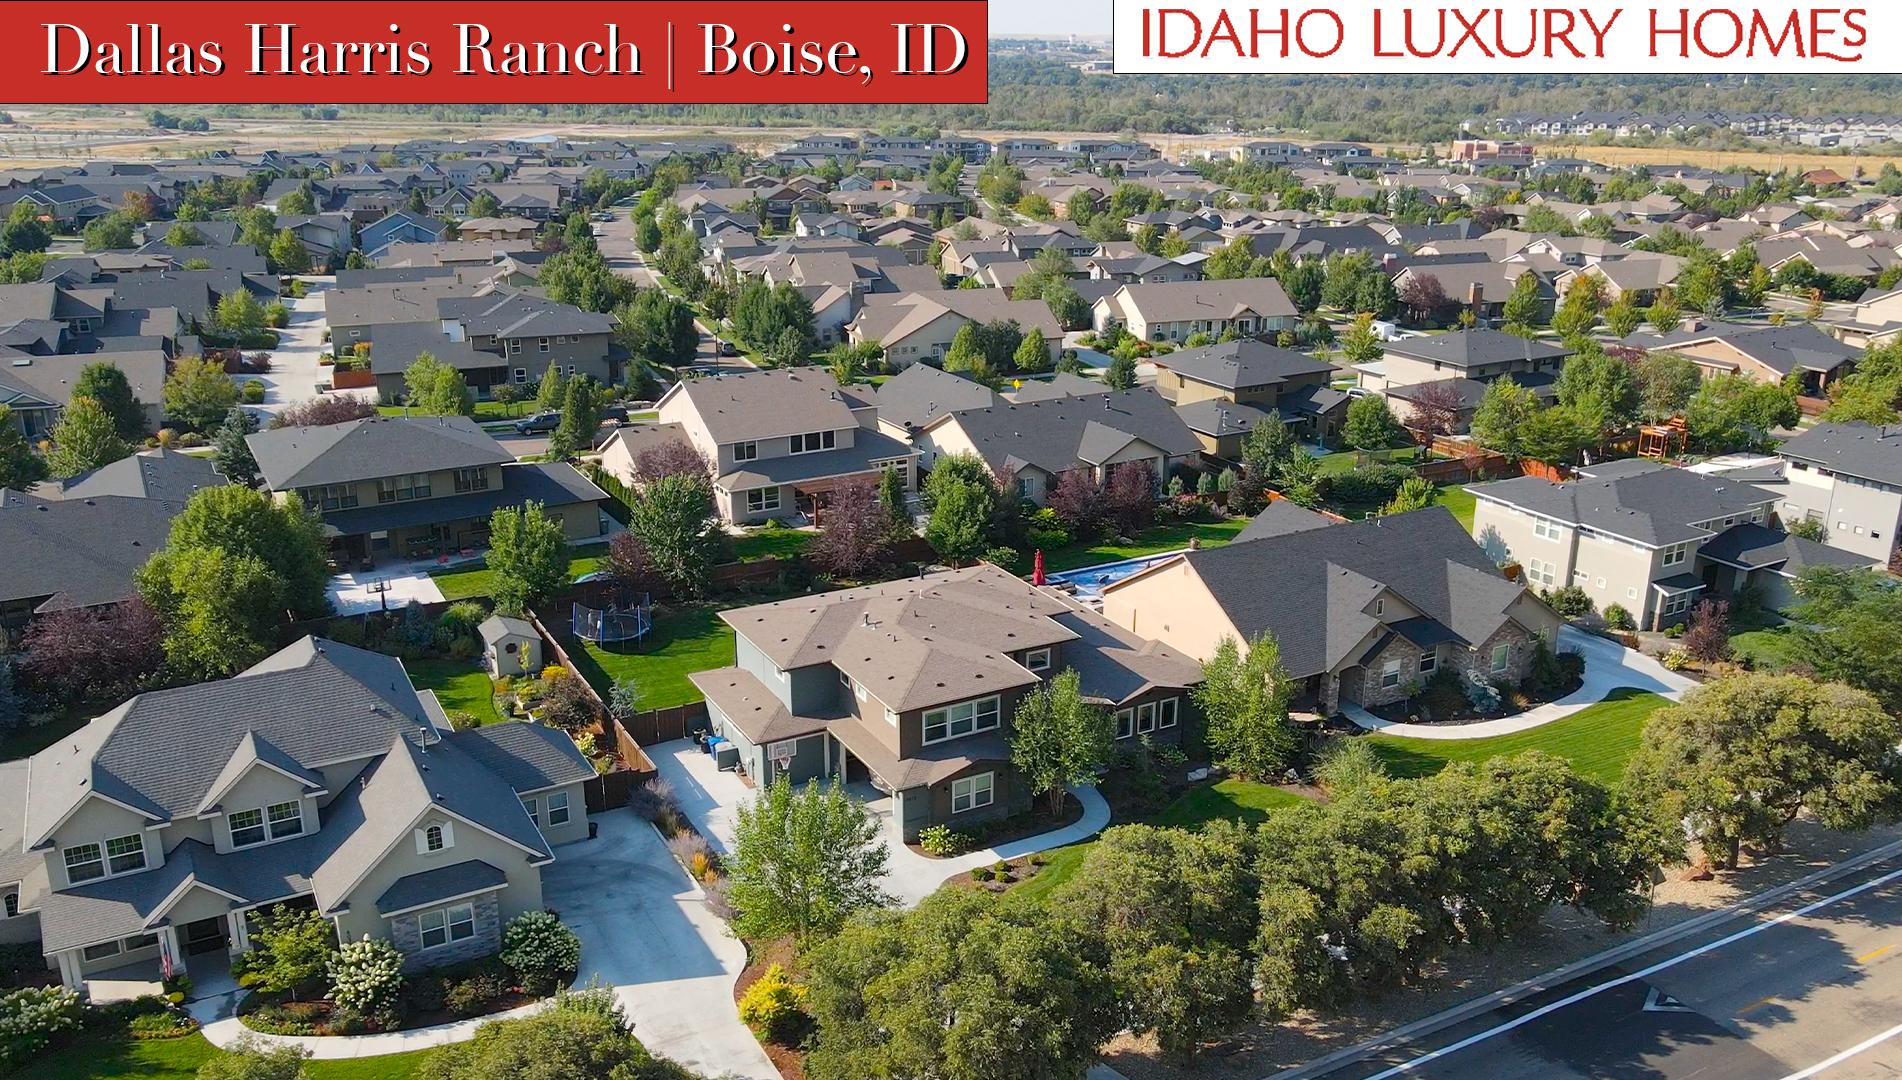 Dallas Harris Ranch Real Estate